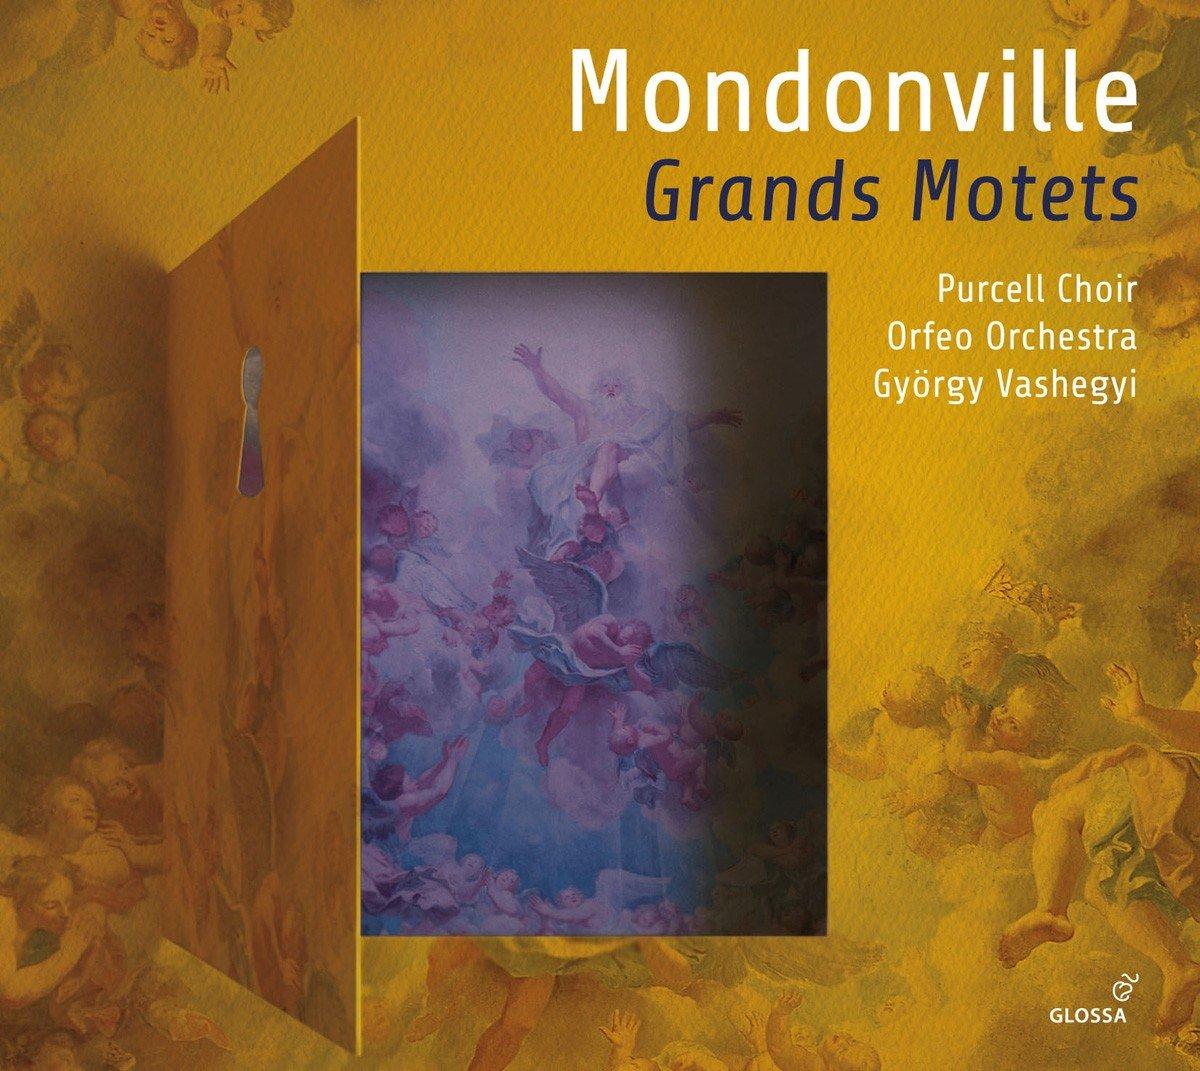 Grands Motets | Mondonville